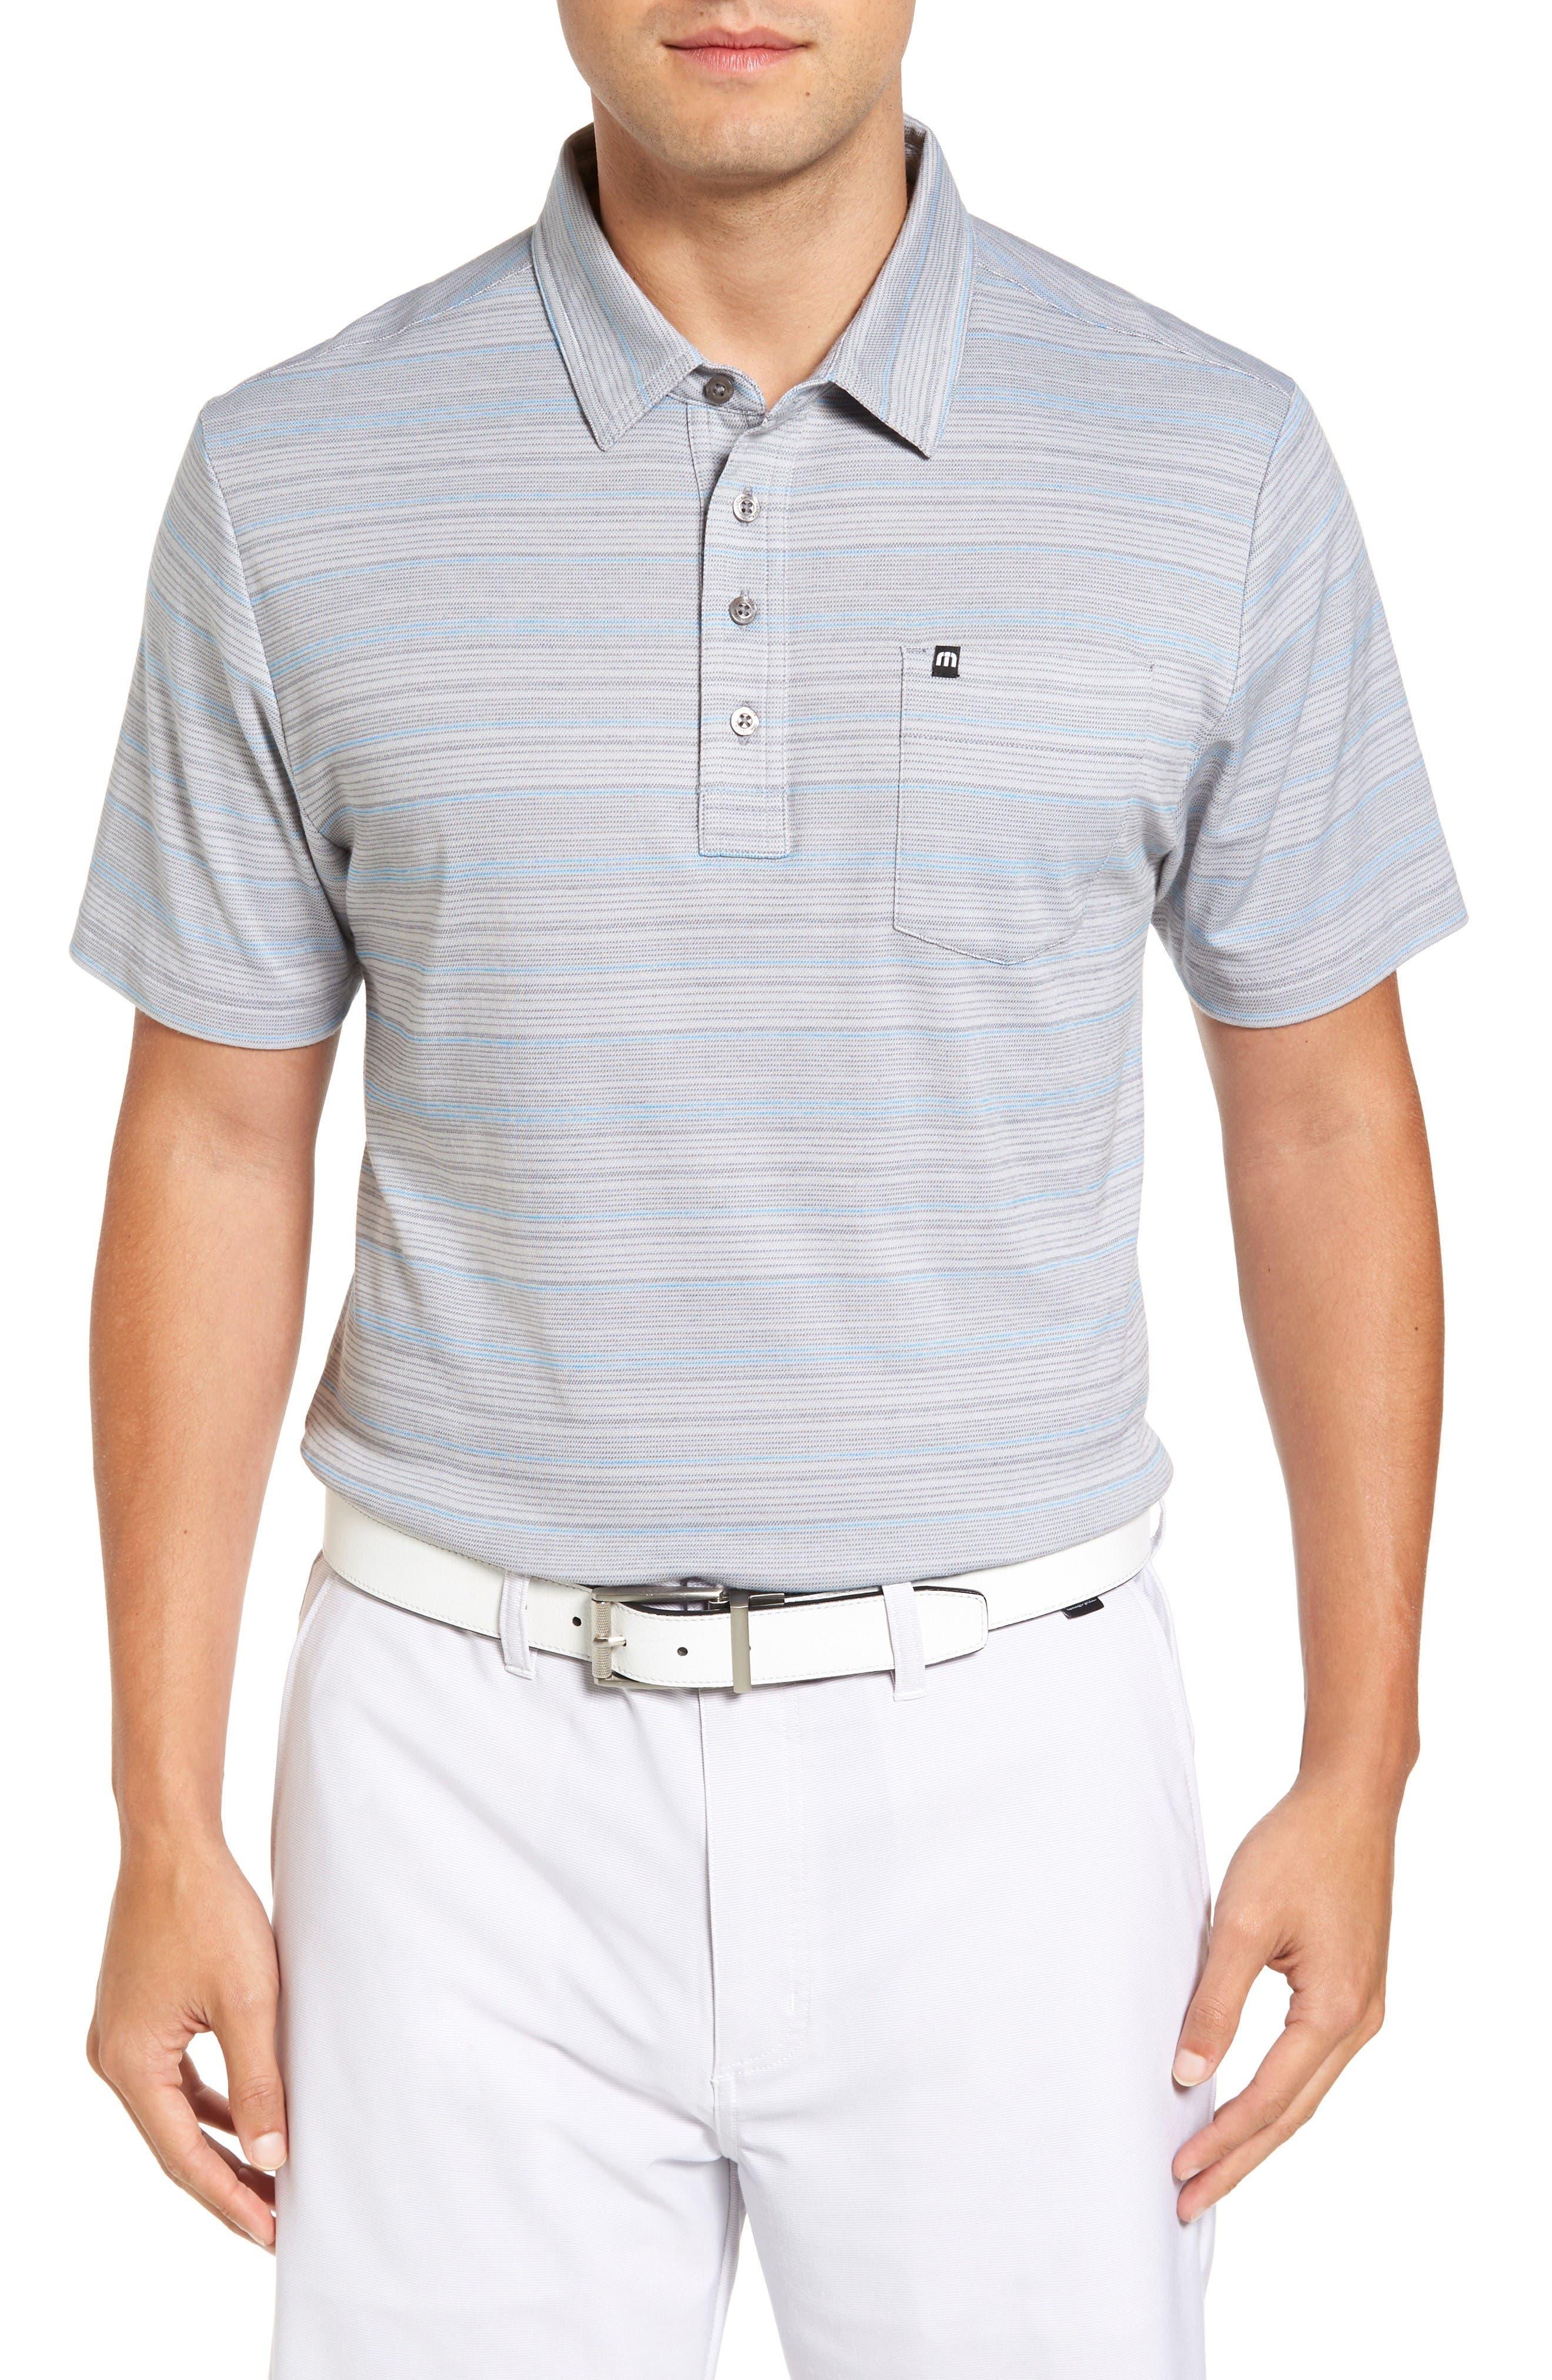 TRAVIS MATHEW Kimm Slim Fit Wrinkle-Resistant Polo